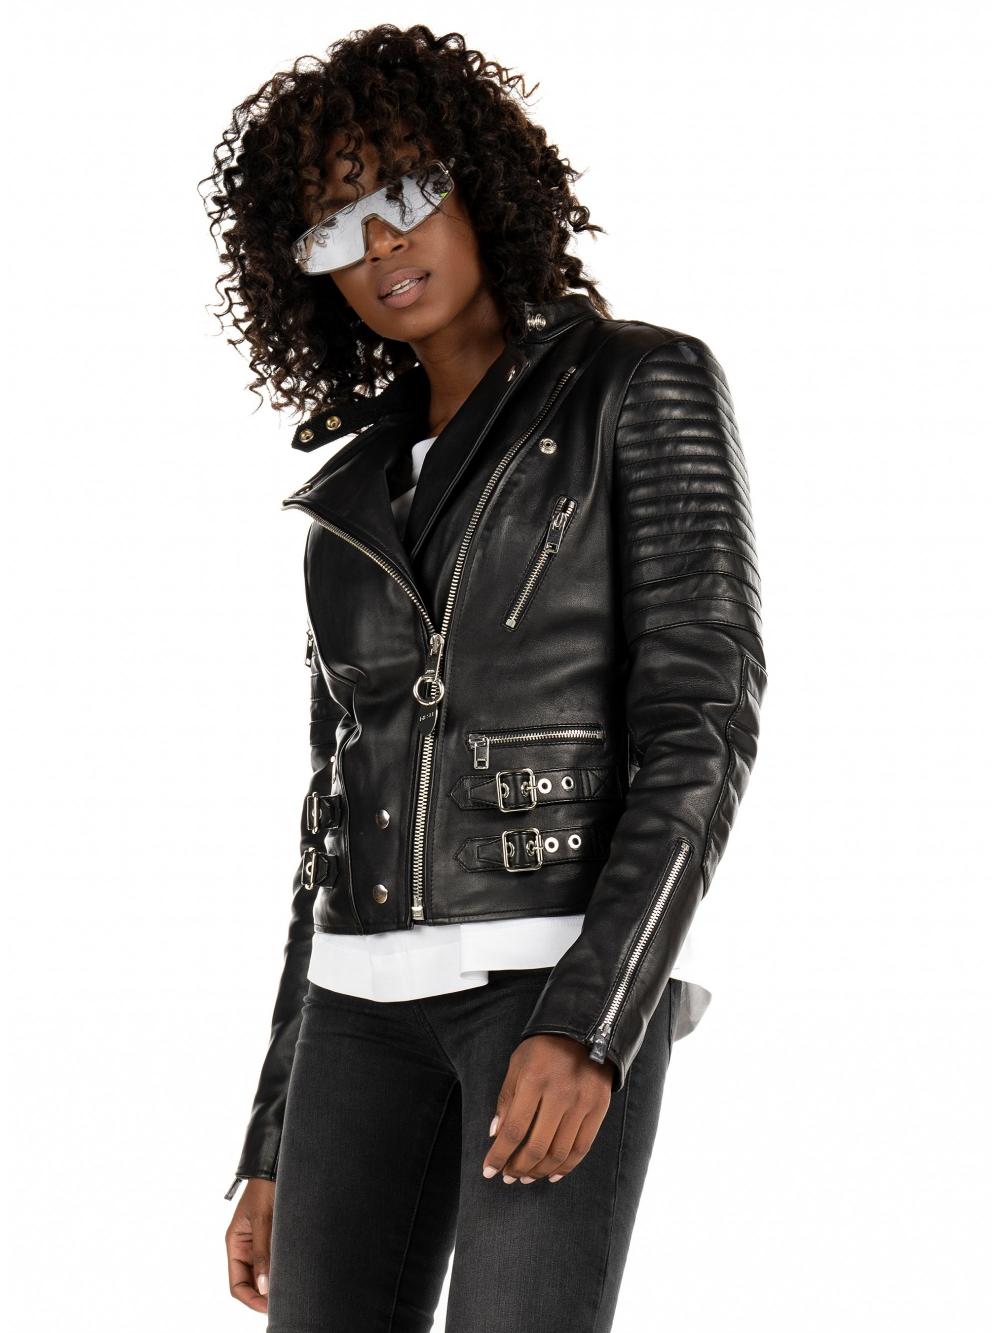 Diesel Leather Jacket L Ige New Black Gynaika F8inopwro Xeimwnas 2020 21 Leather Jacket Women Fashion [ 1333 x 1000 Pixel ]